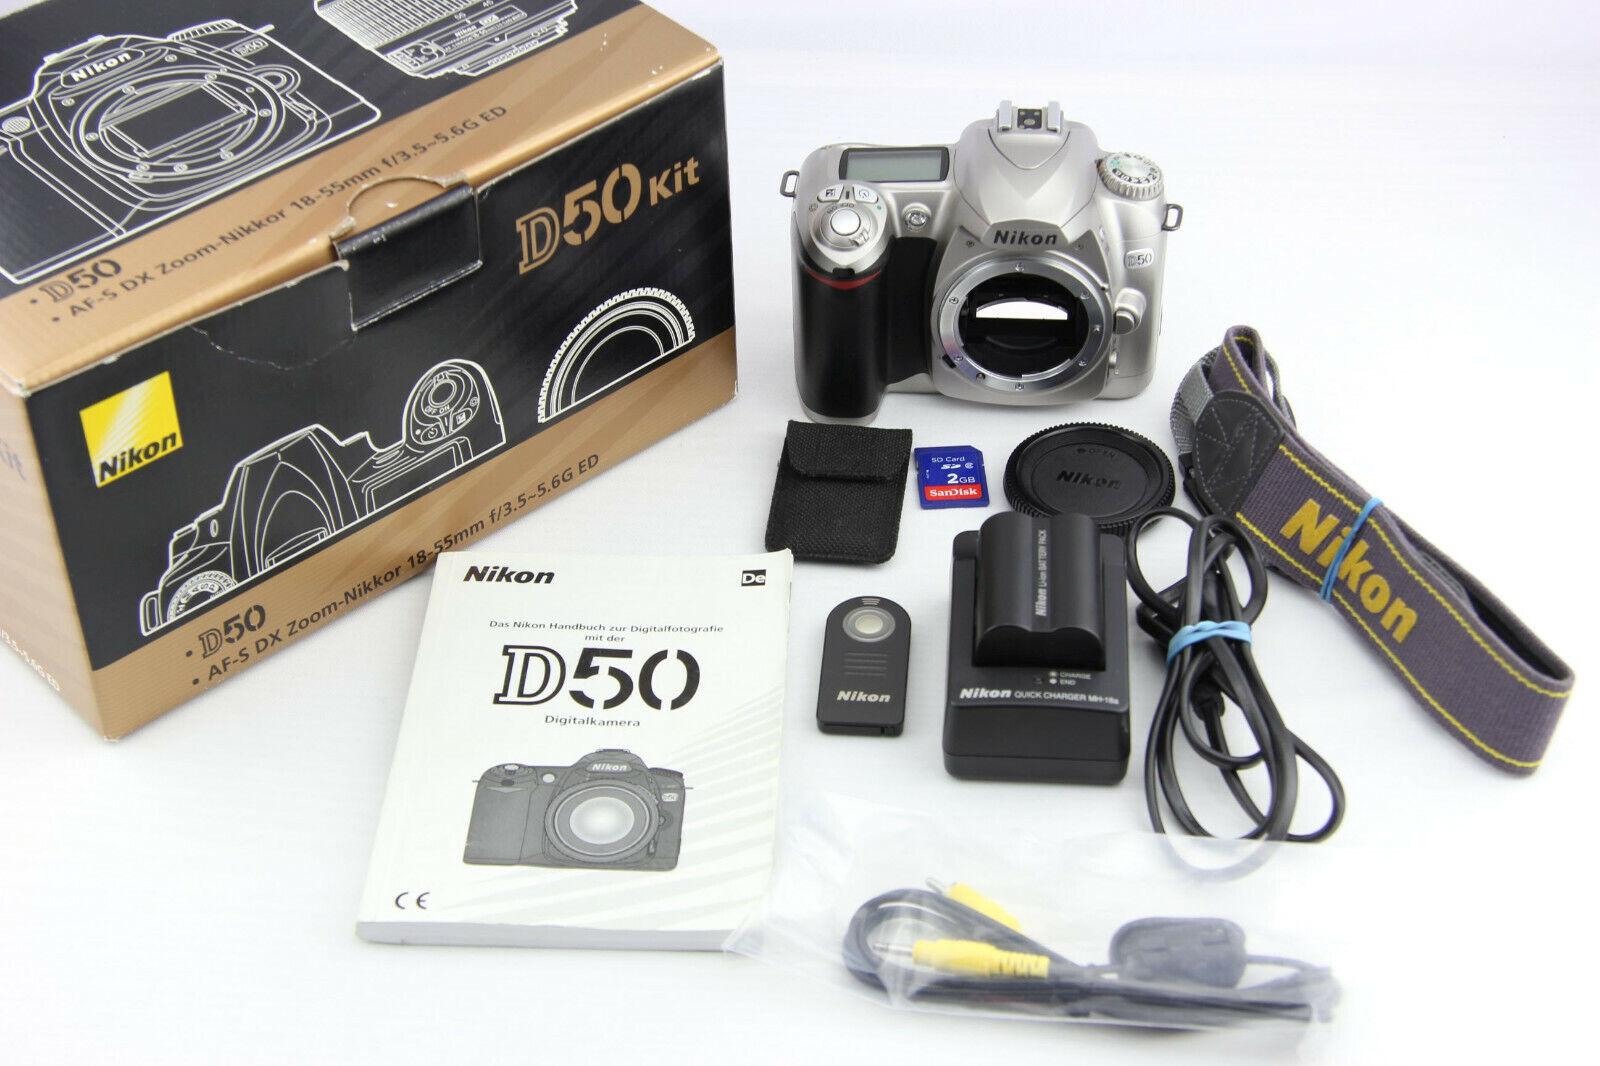 Nikon D50 digitale Spiegelreflexkamera 46,5 Tsd. Auslöser in OVP # 7365